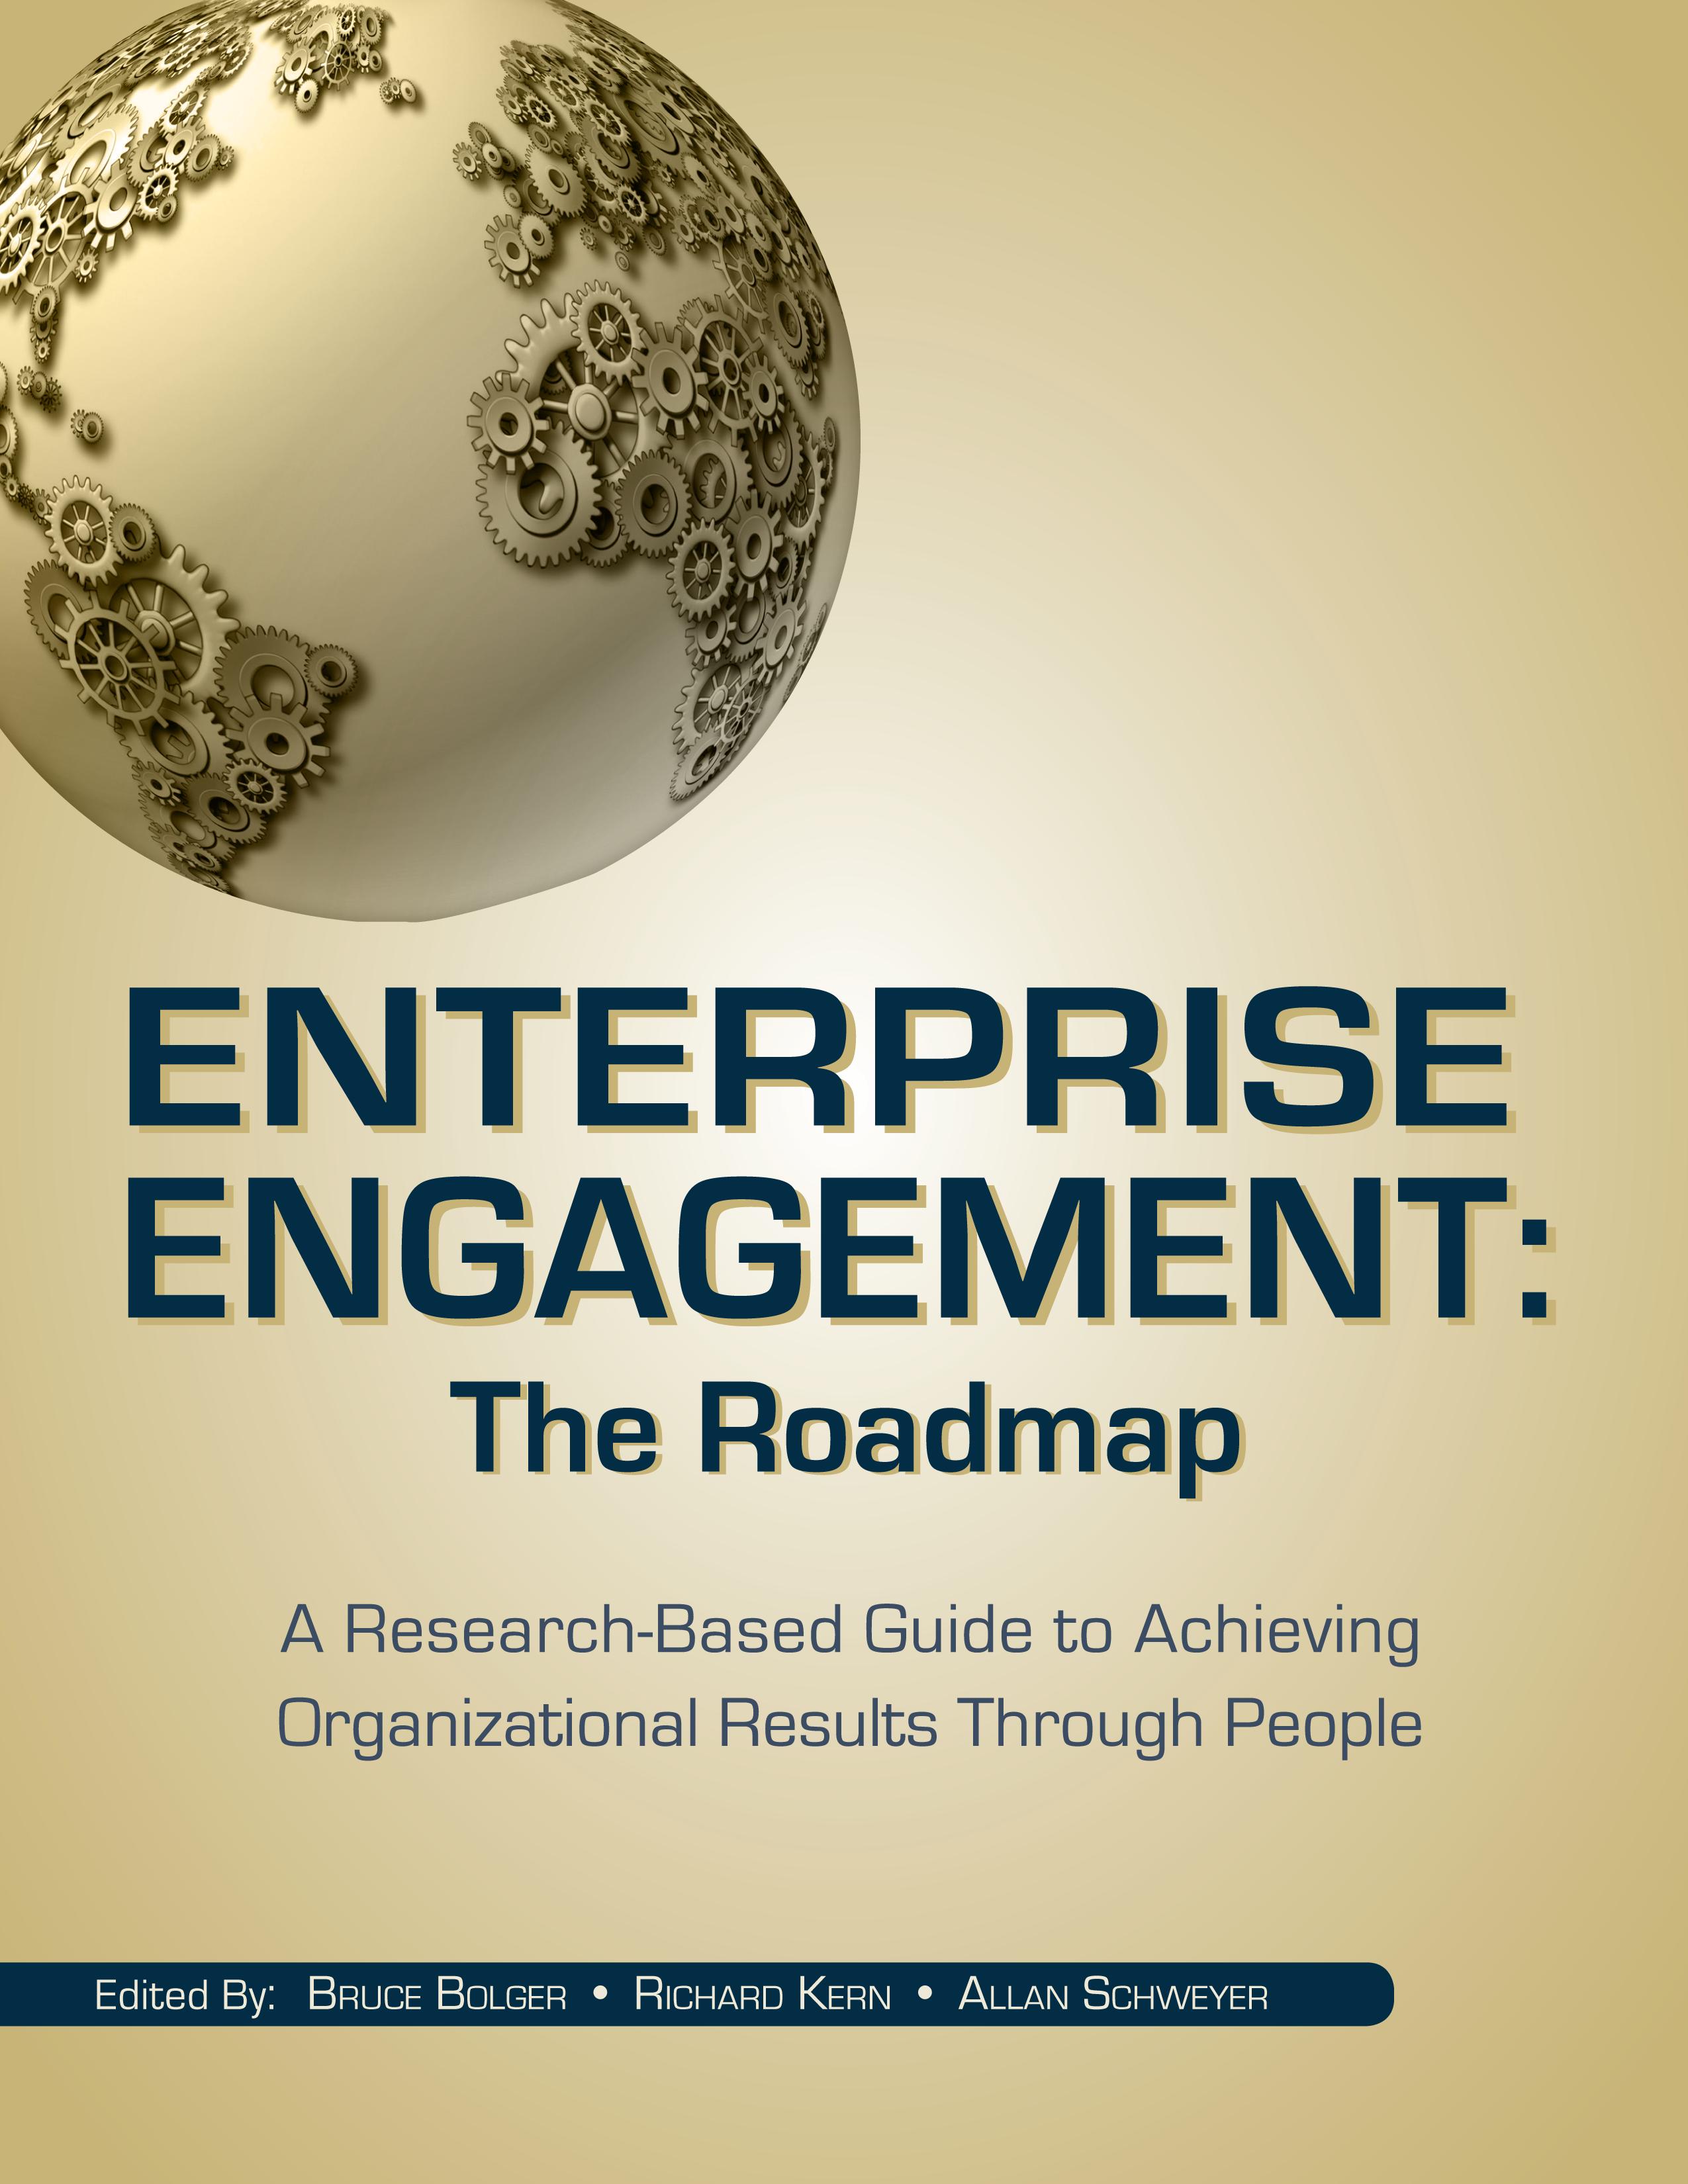 Enterprise Engagement: The Textbook